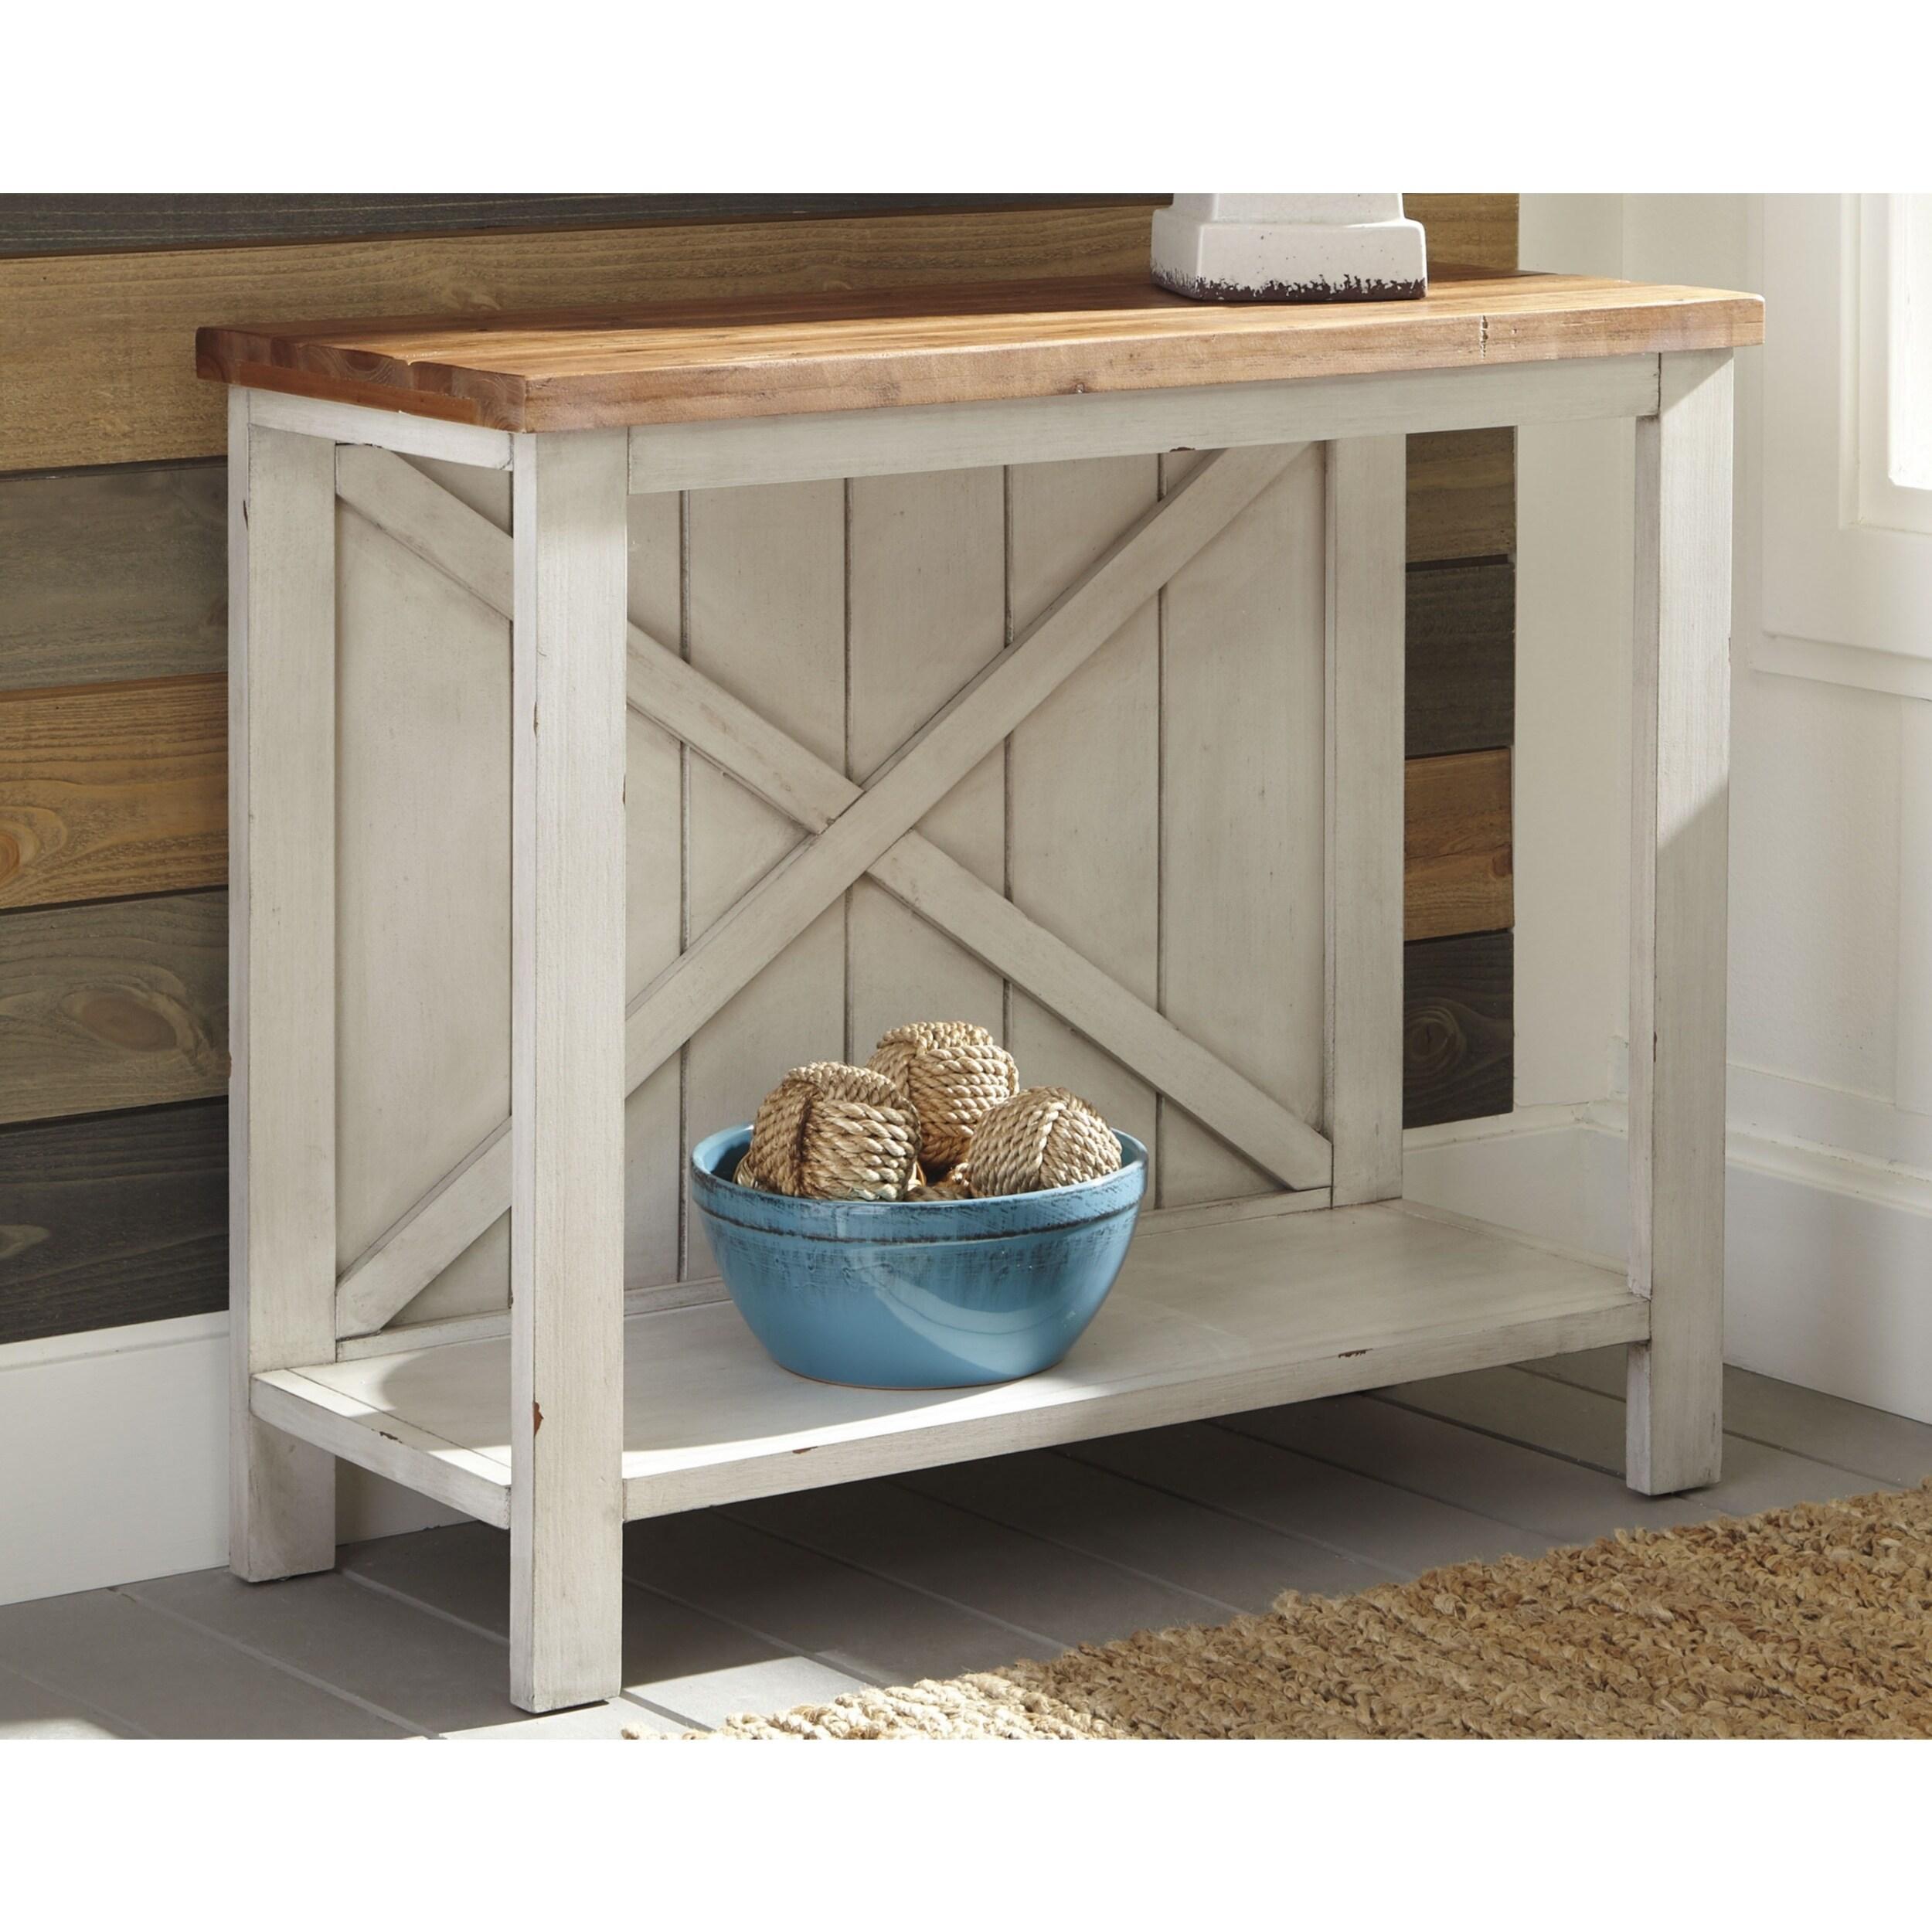 Awesome Abramsland White Brown Farmhouse Console Sofa Table Spiritservingveterans Wood Chair Design Ideas Spiritservingveteransorg